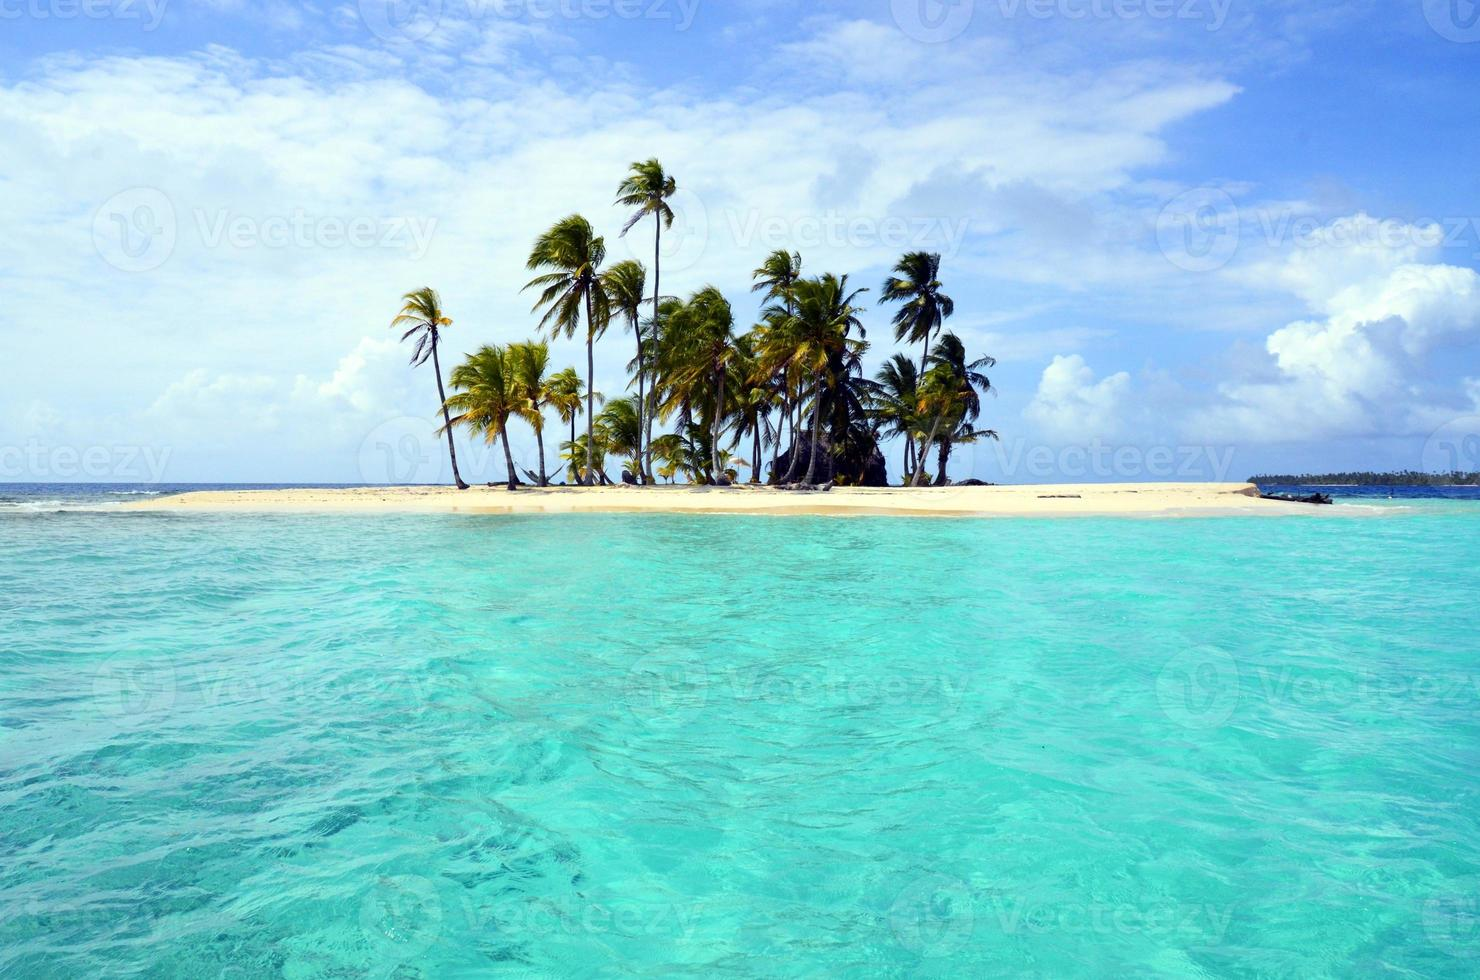 Kuna Yala - San Blas Island photo